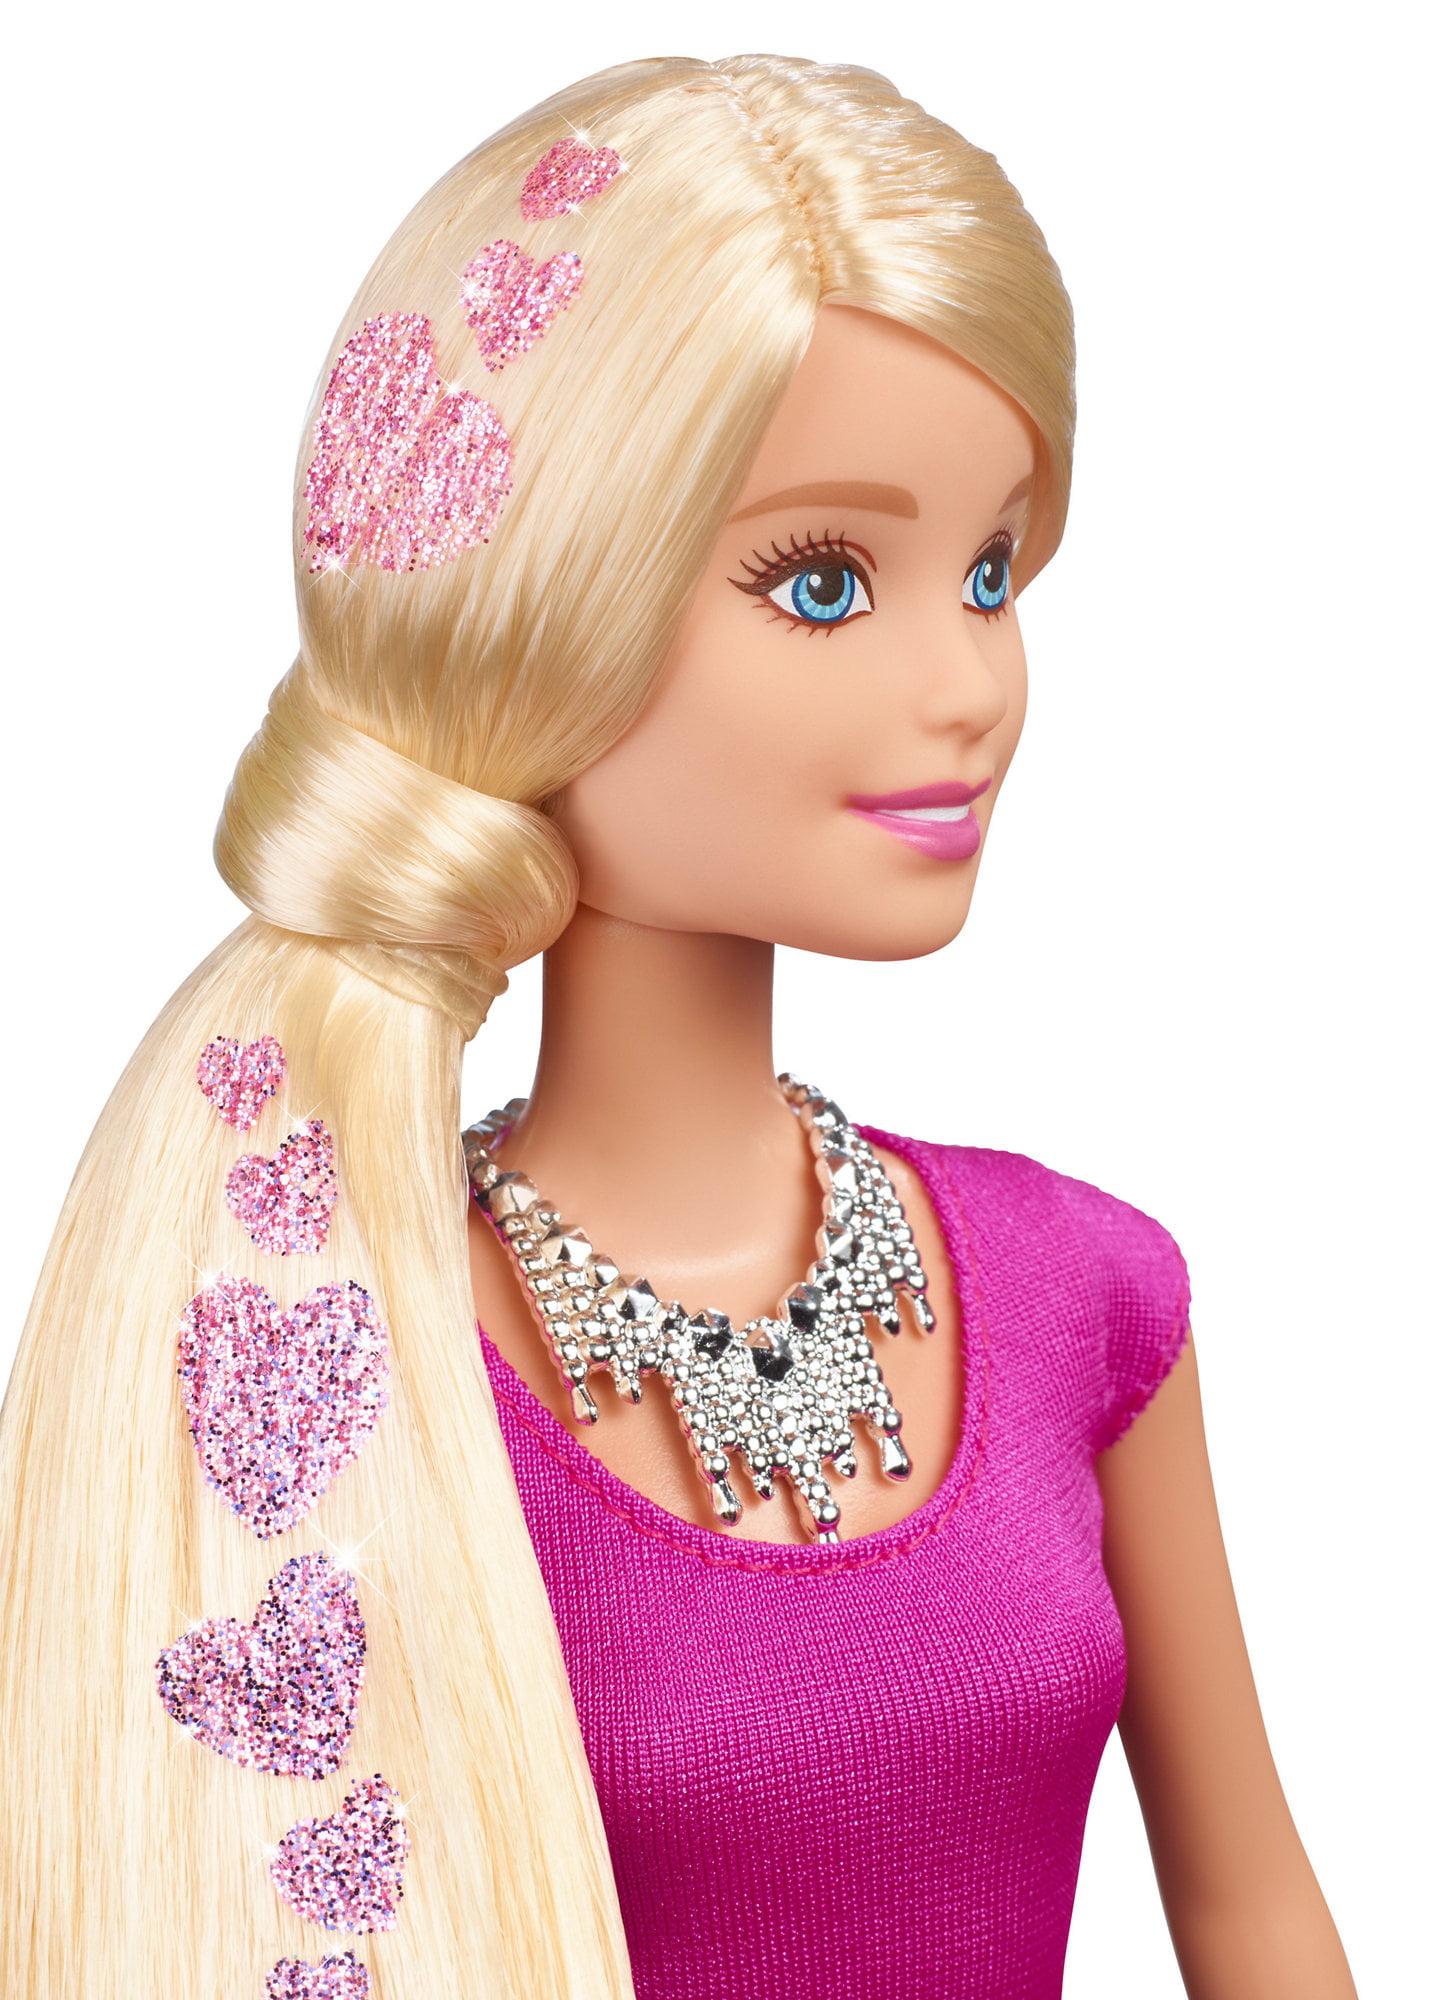 Barbie Glitter Hair Doll Walmartcom - Doll hairstyles barbie